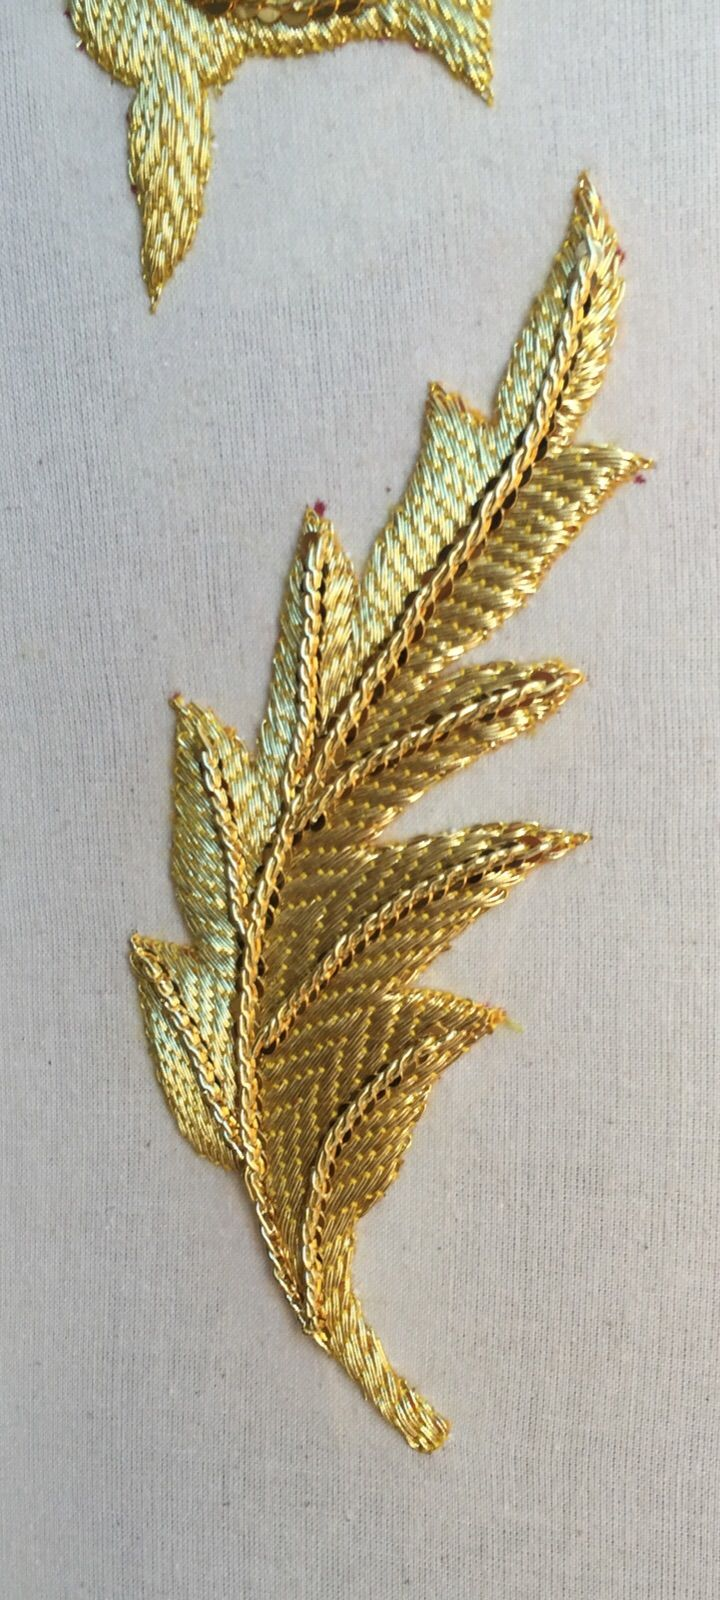 Best вышивка золотом серебром images on pinterest